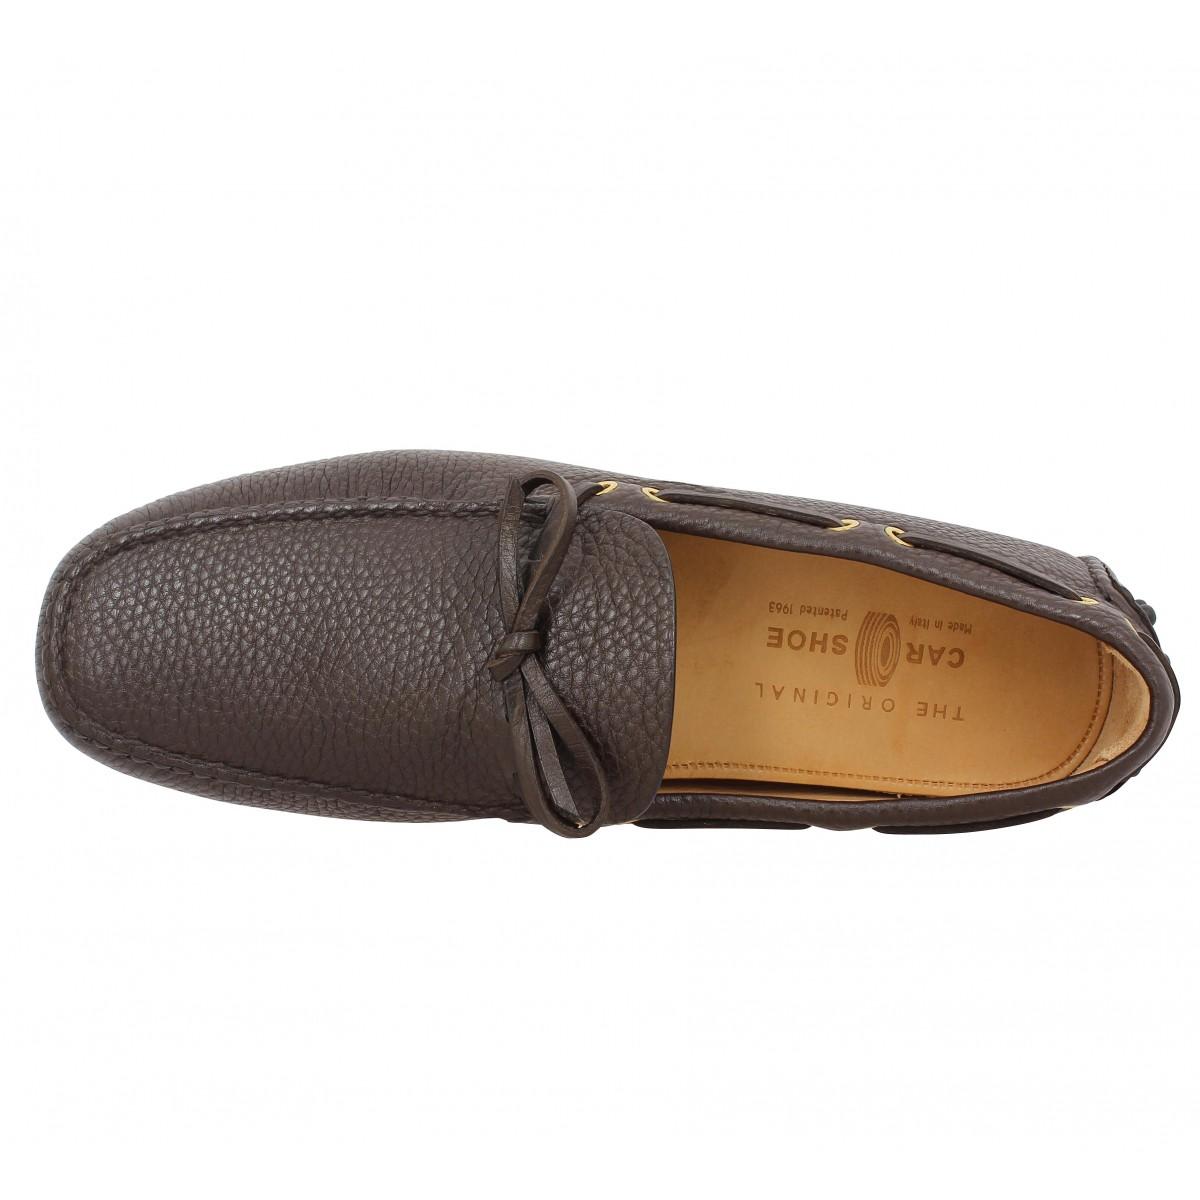 car shoe driving shoes cuir graine homme cafe homme fanny chaussures. Black Bedroom Furniture Sets. Home Design Ideas